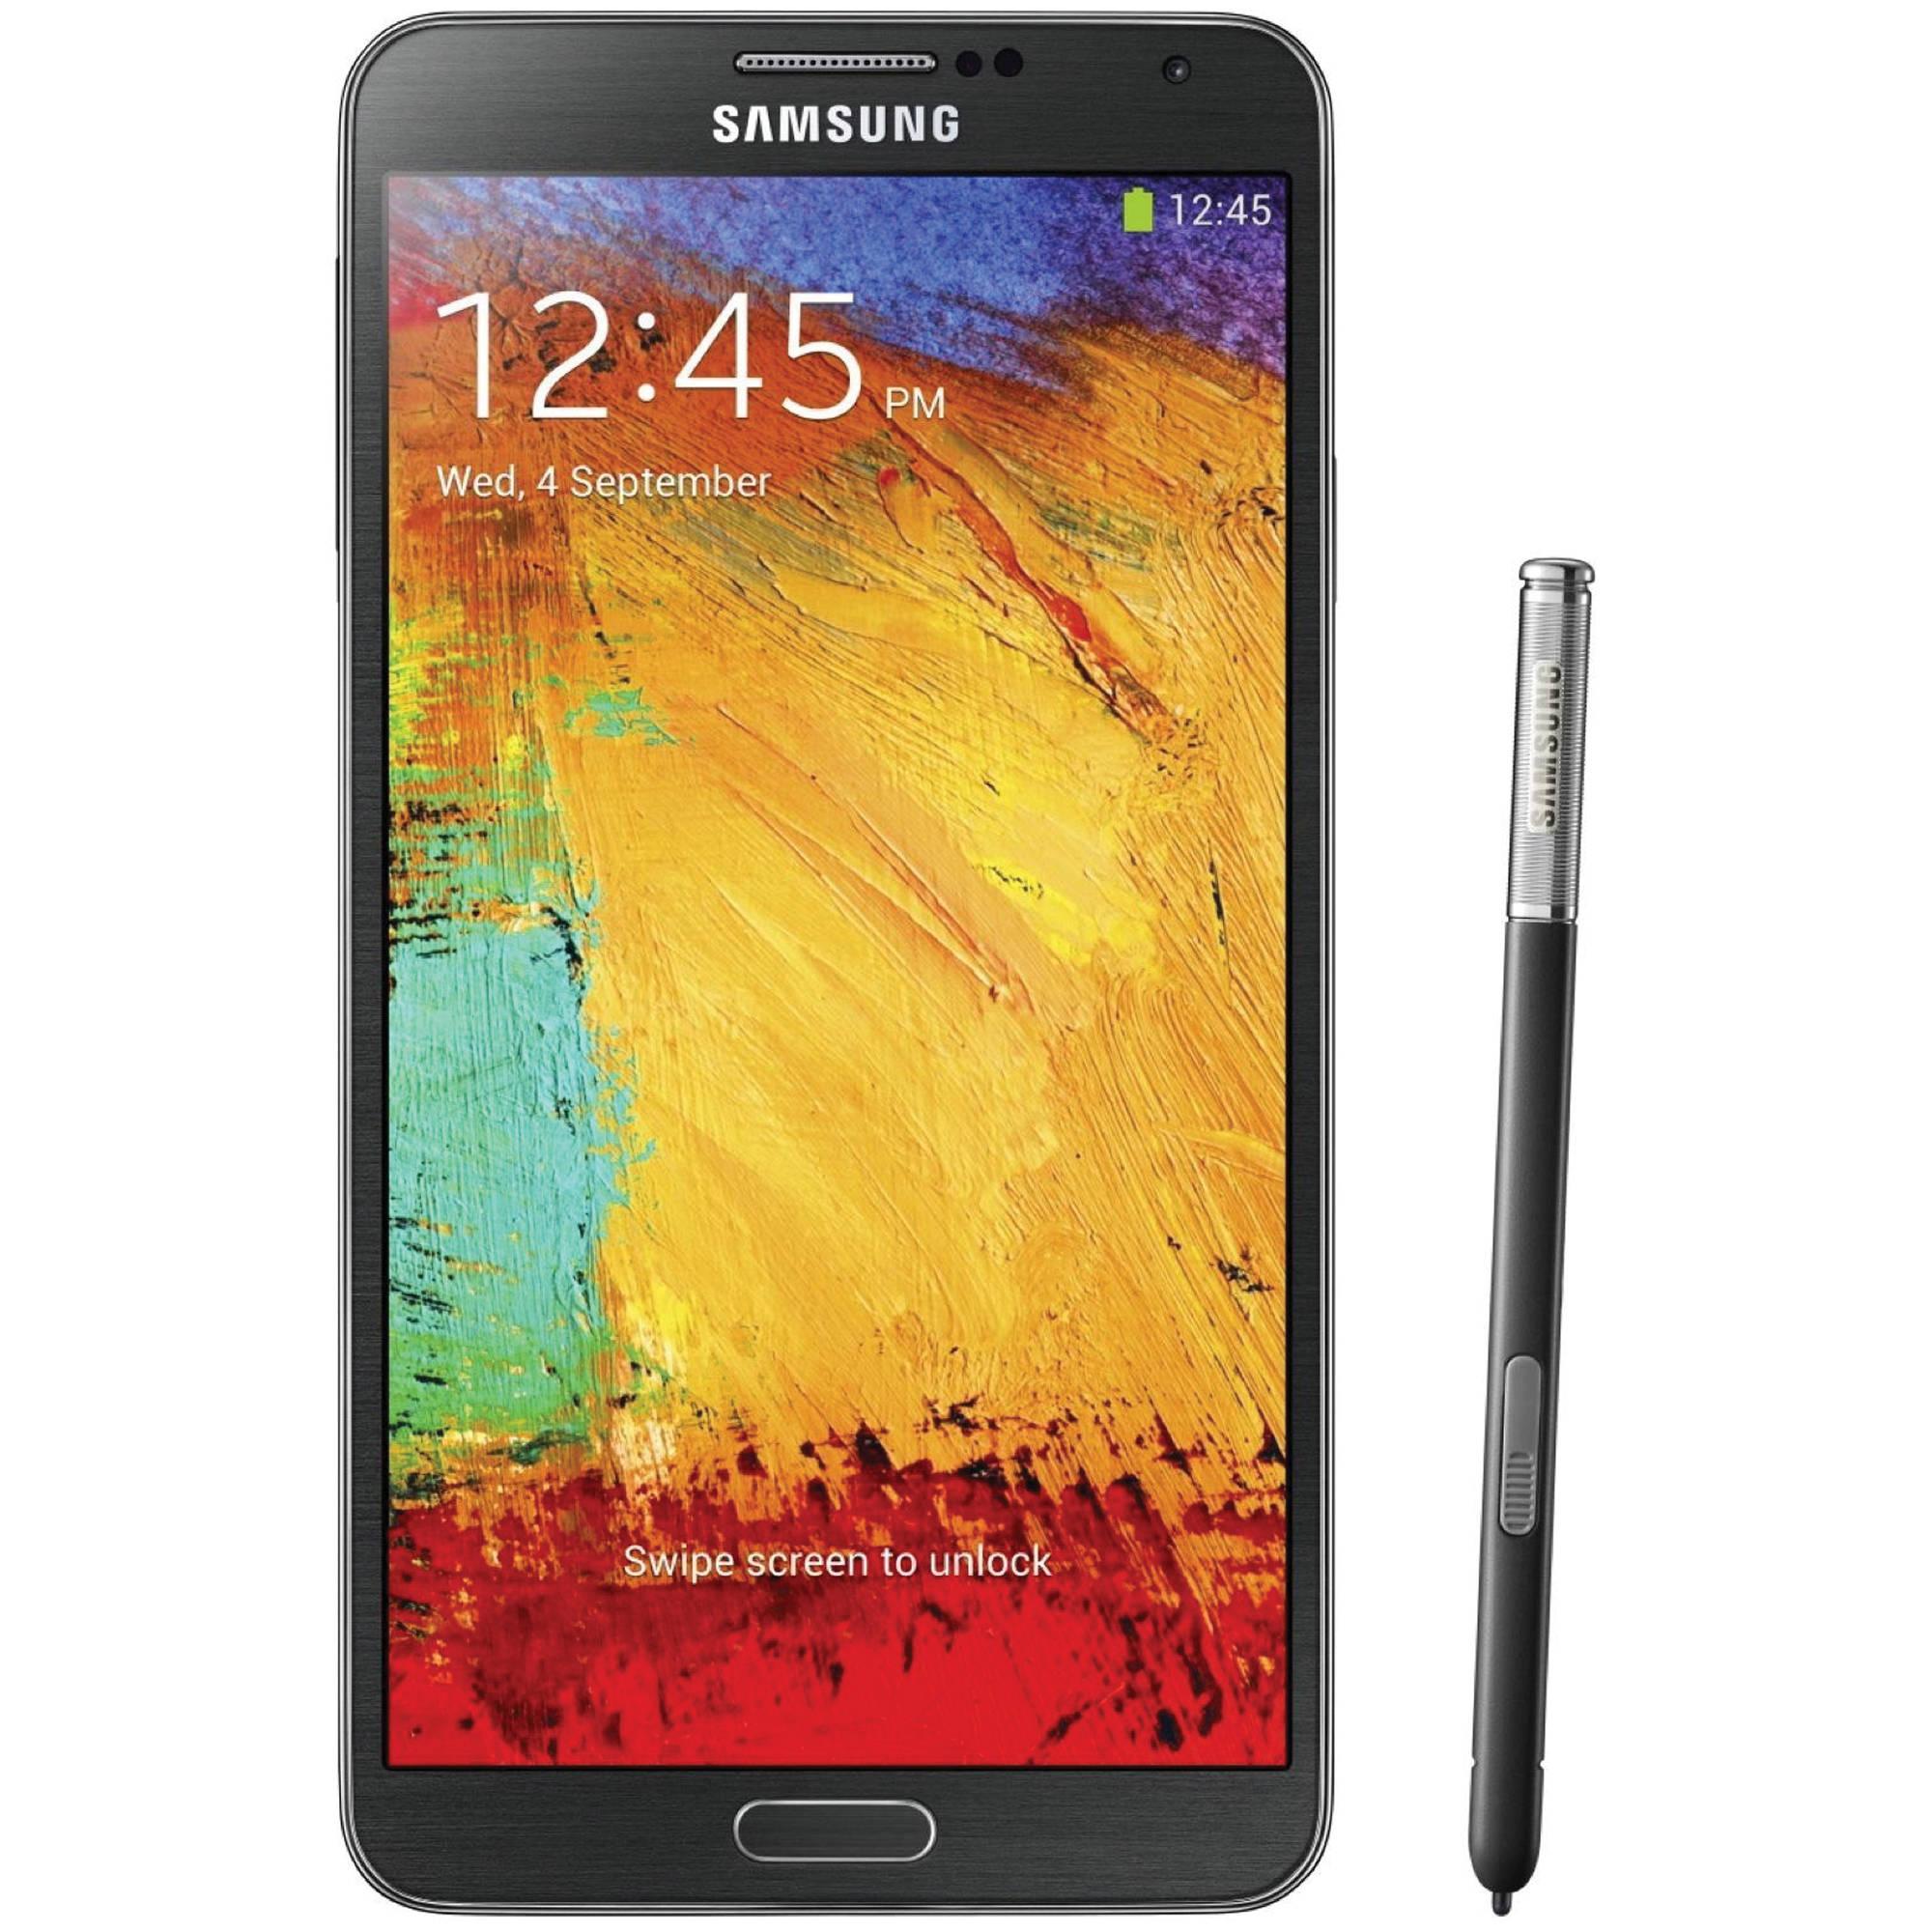 Samsung SM-N750 Image